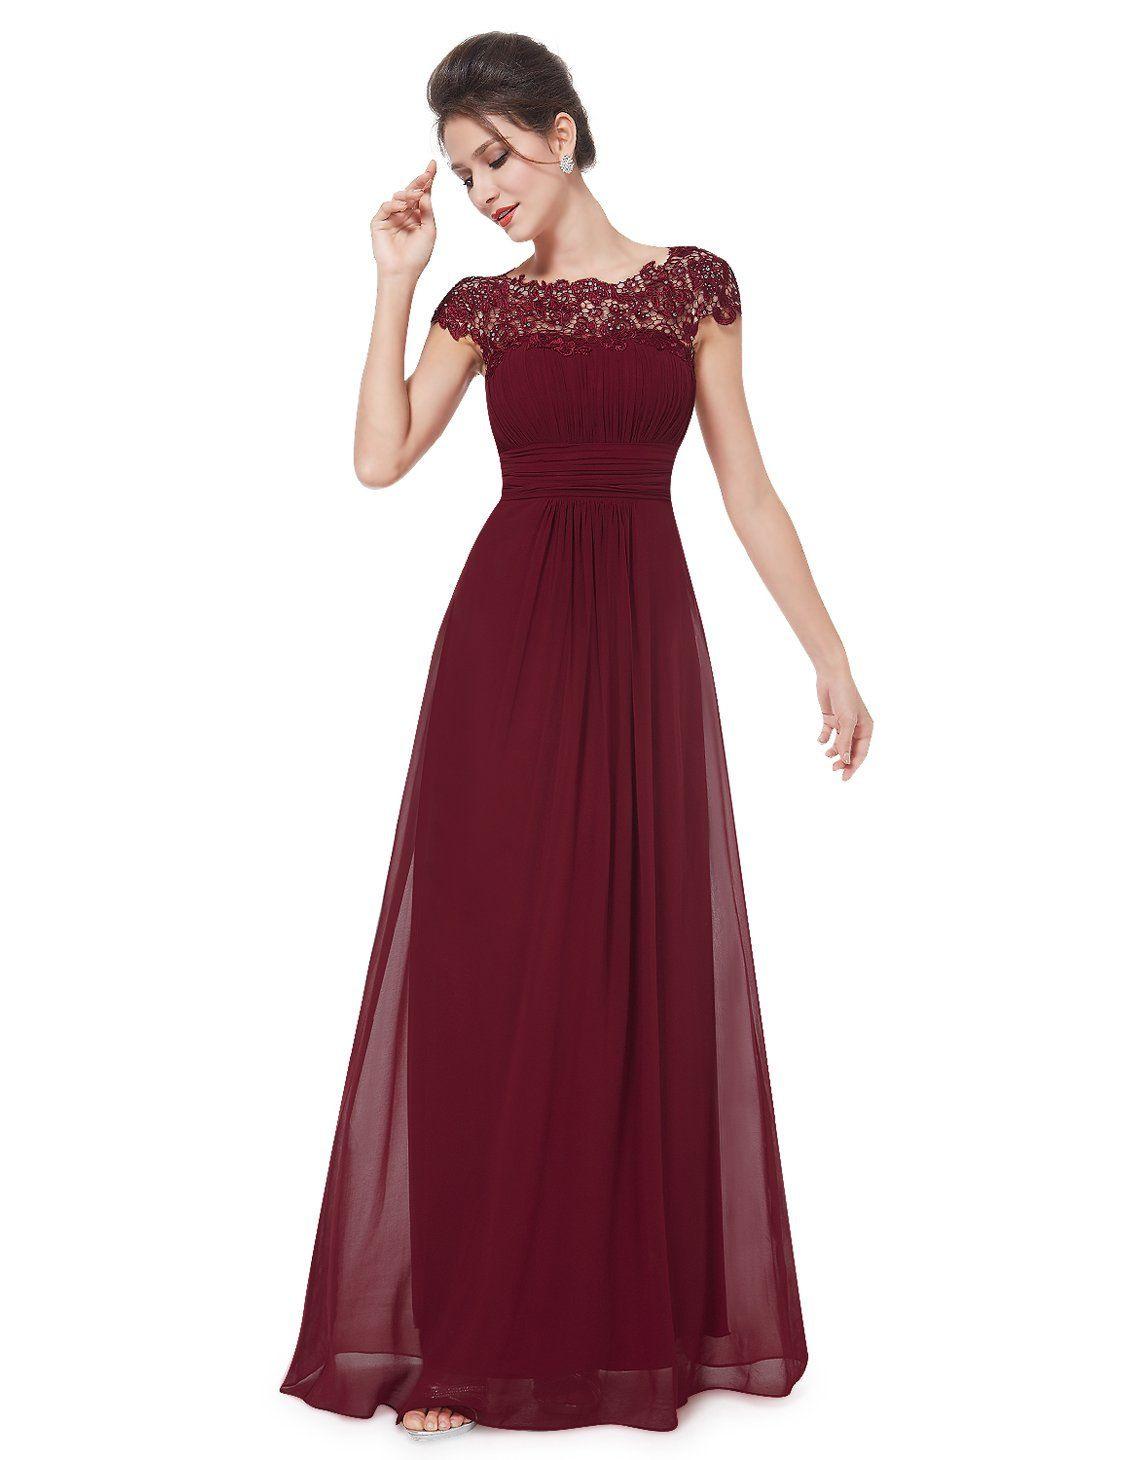 10 Kreativ Lange Abendkleider Damen SpezialgebietDesigner Elegant Lange Abendkleider Damen Boutique